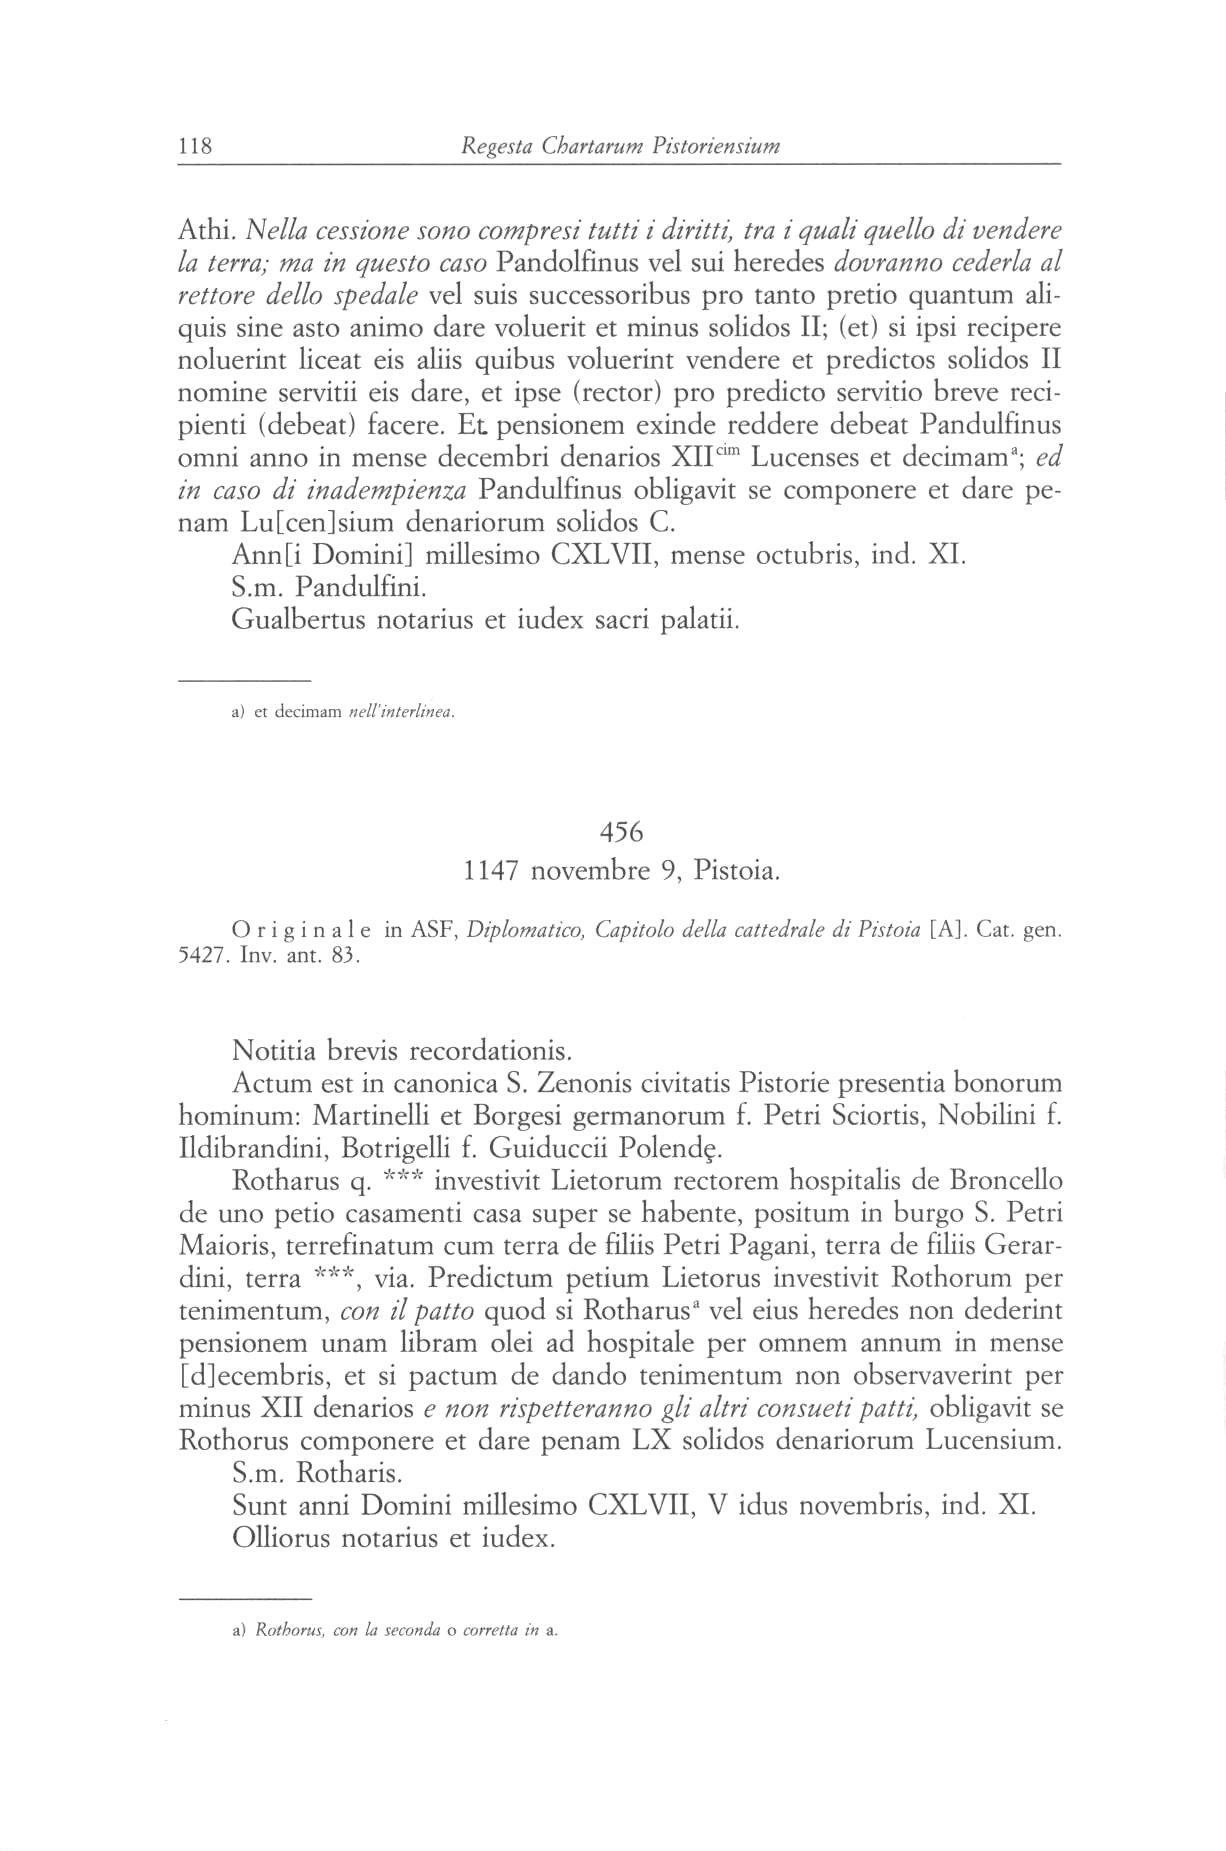 Canonica S. Zenone XII 0118.jpg